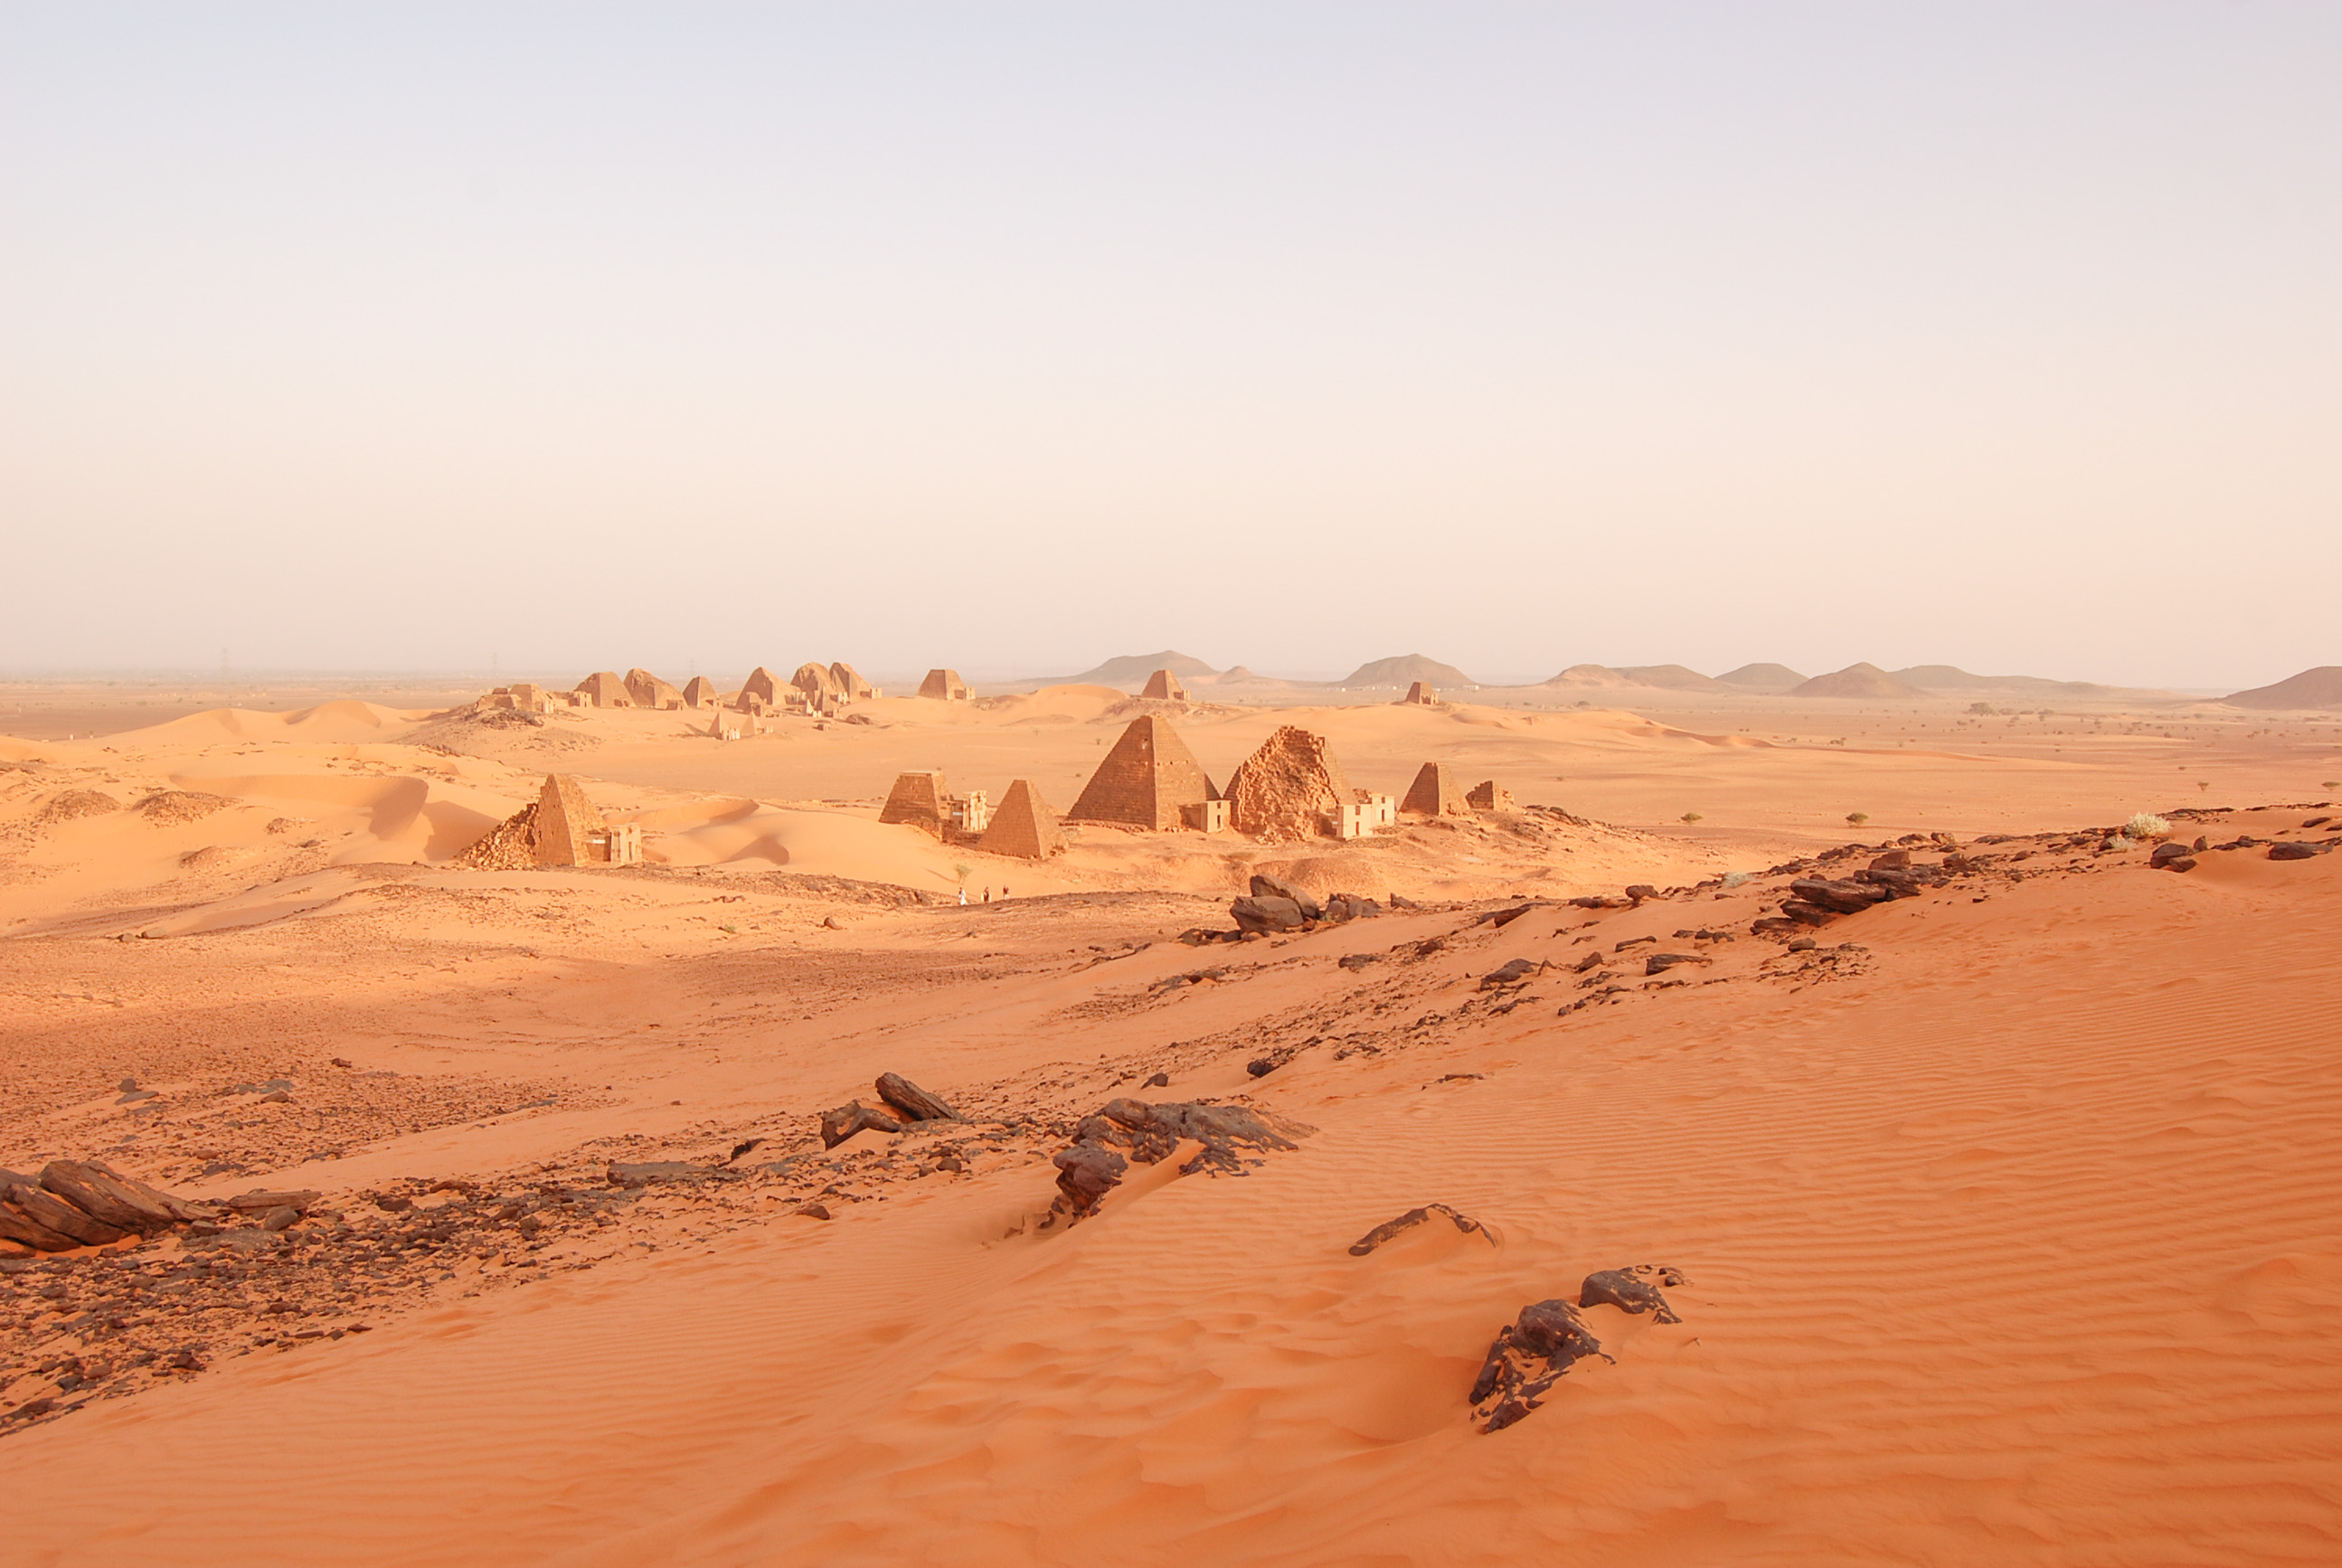 https://bubo.sk/uploads/galleries/17820/lubosfellner_sudan_viac-pyramid-nez-v-egypte-meroe.jpg